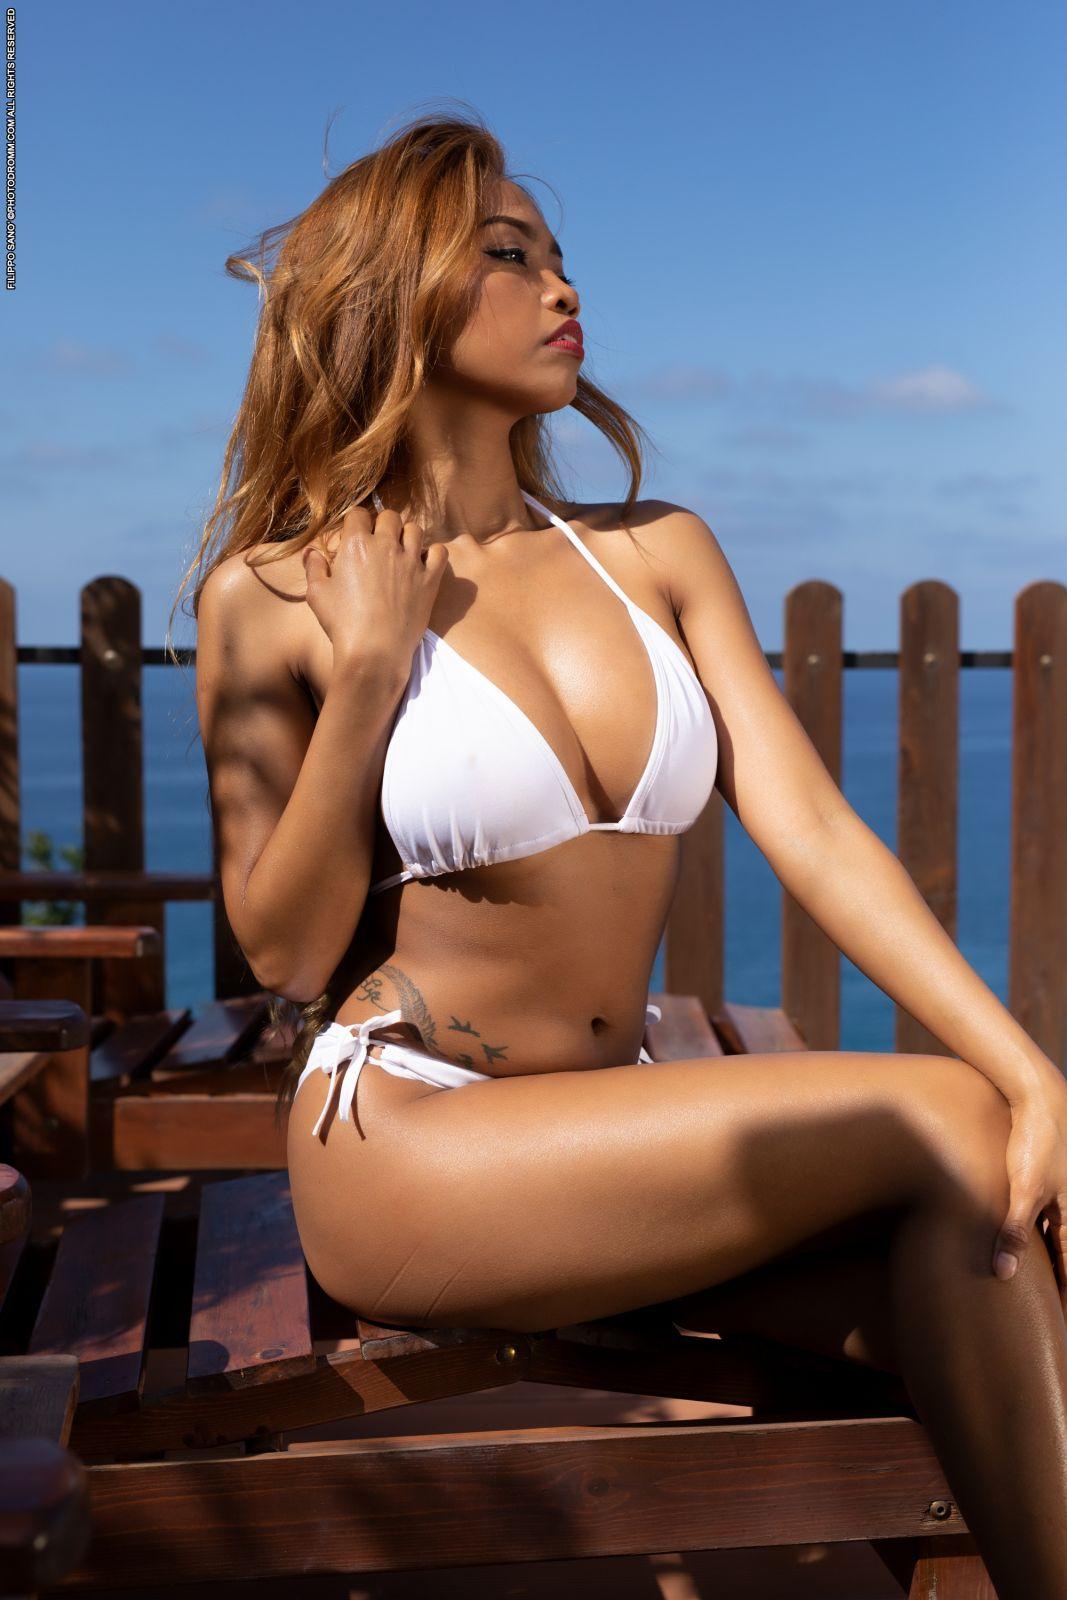 Girl Perfect Body Strips